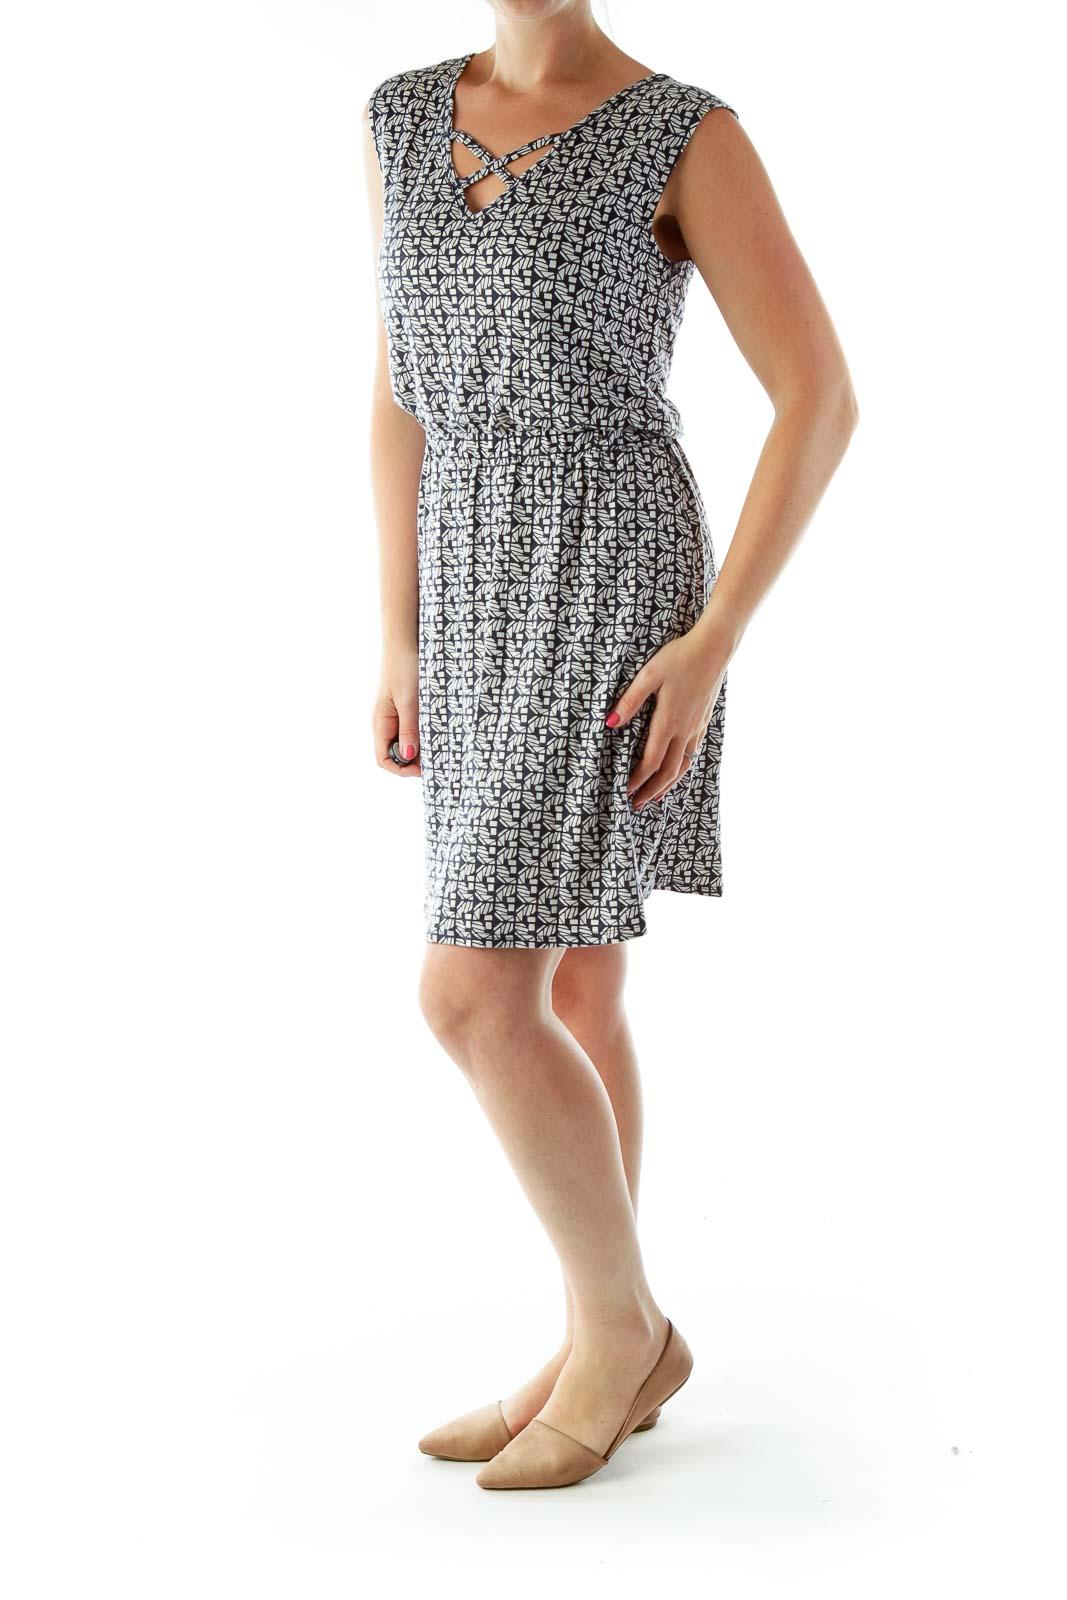 Black White Print Sleeveless Day Dress